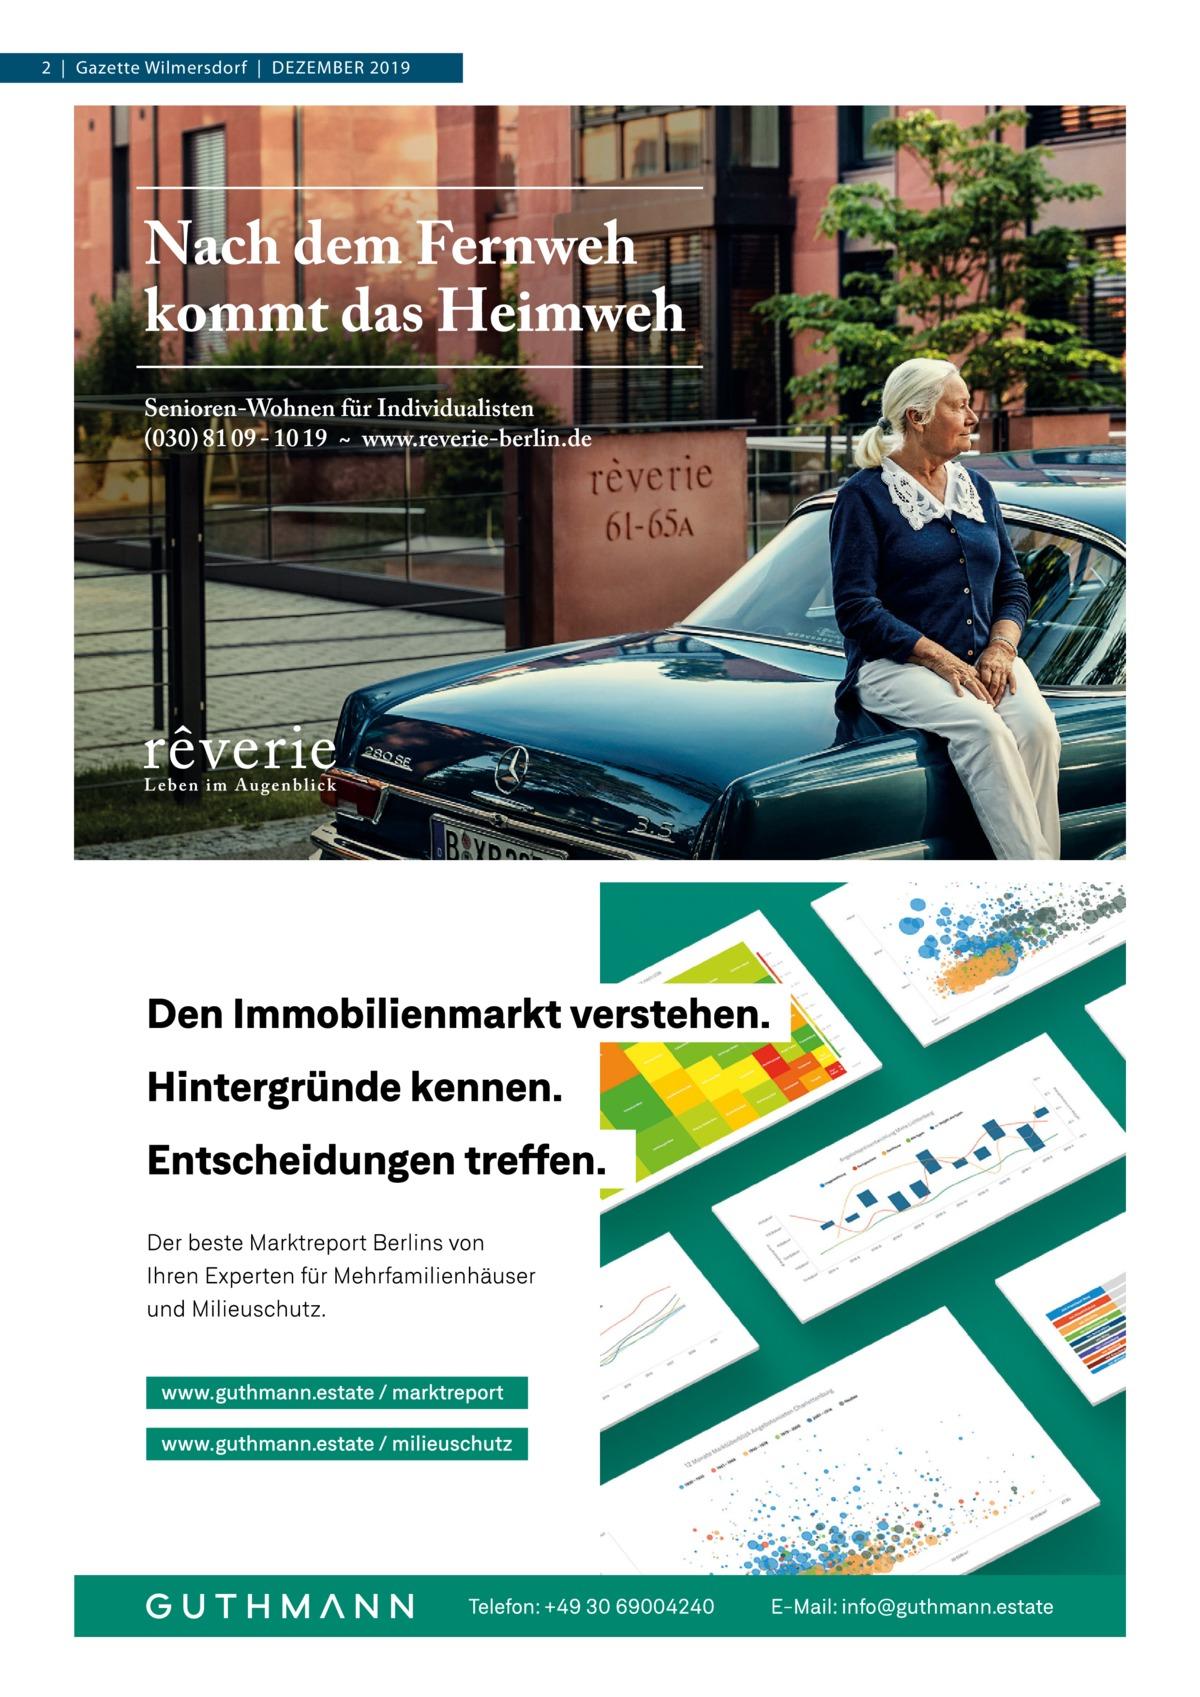 2 Gazette Wilmersdorf Dezember 2019